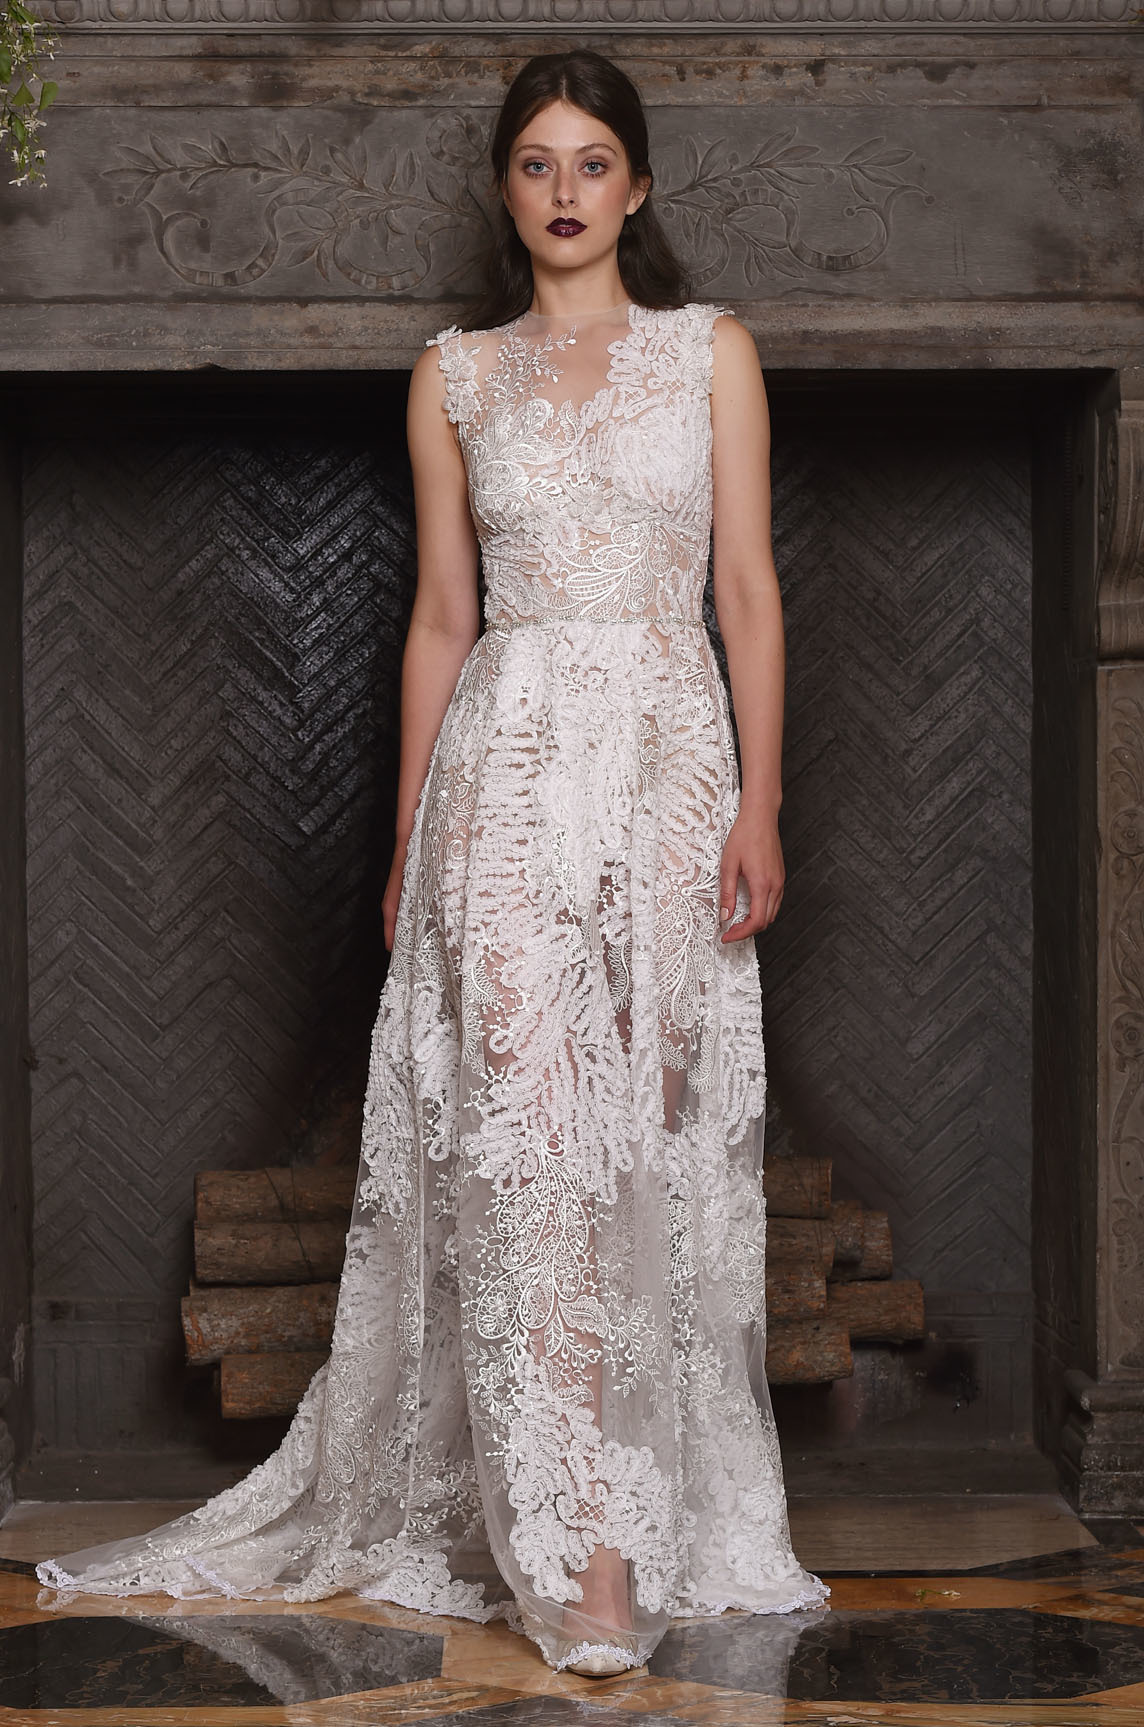 sheer wedding dress